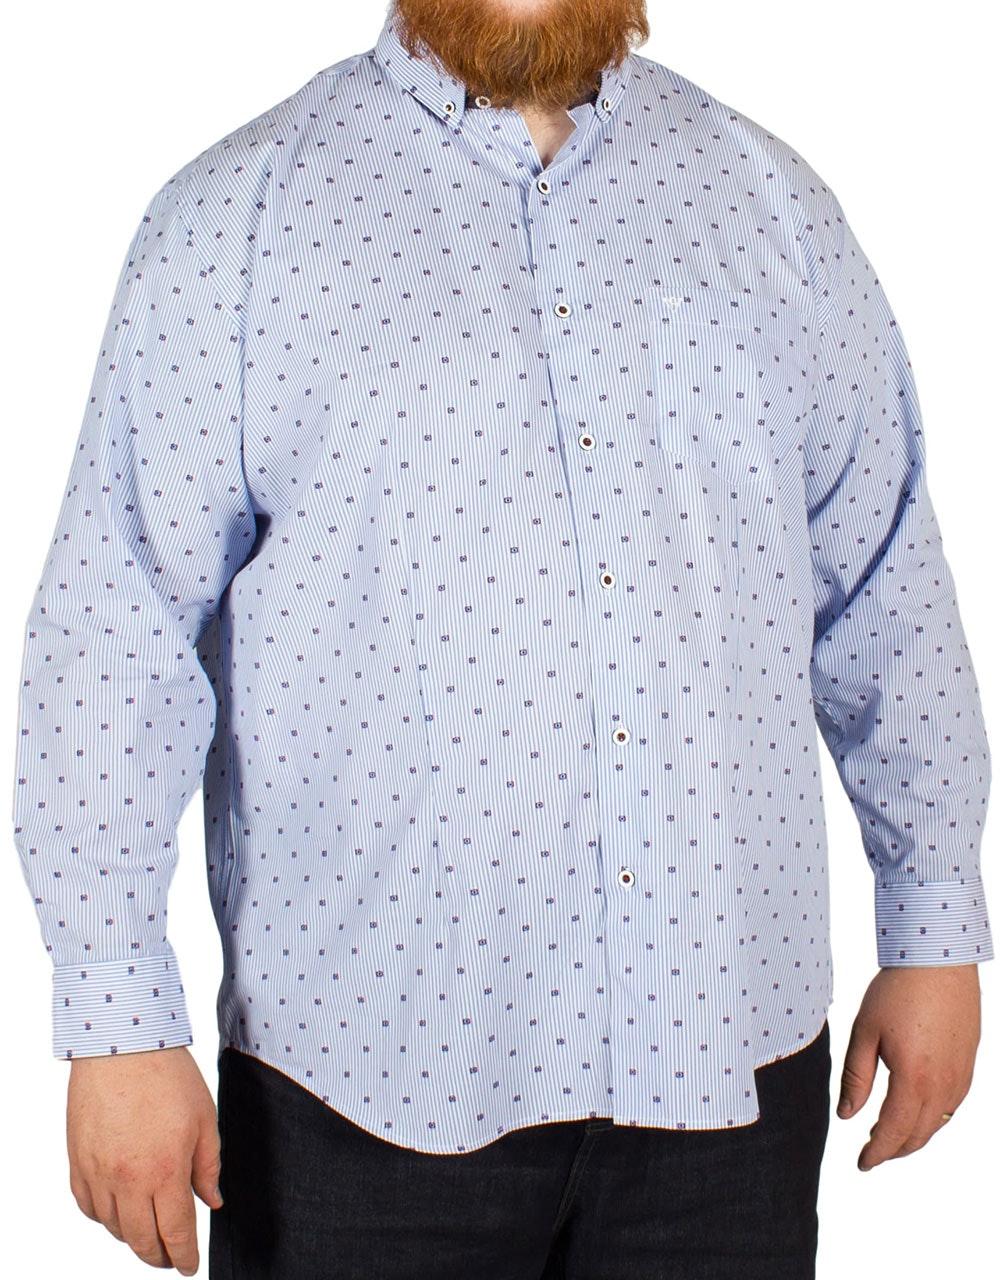 Cotton Valley Stripe Print Long Sleeved Shirt Blue